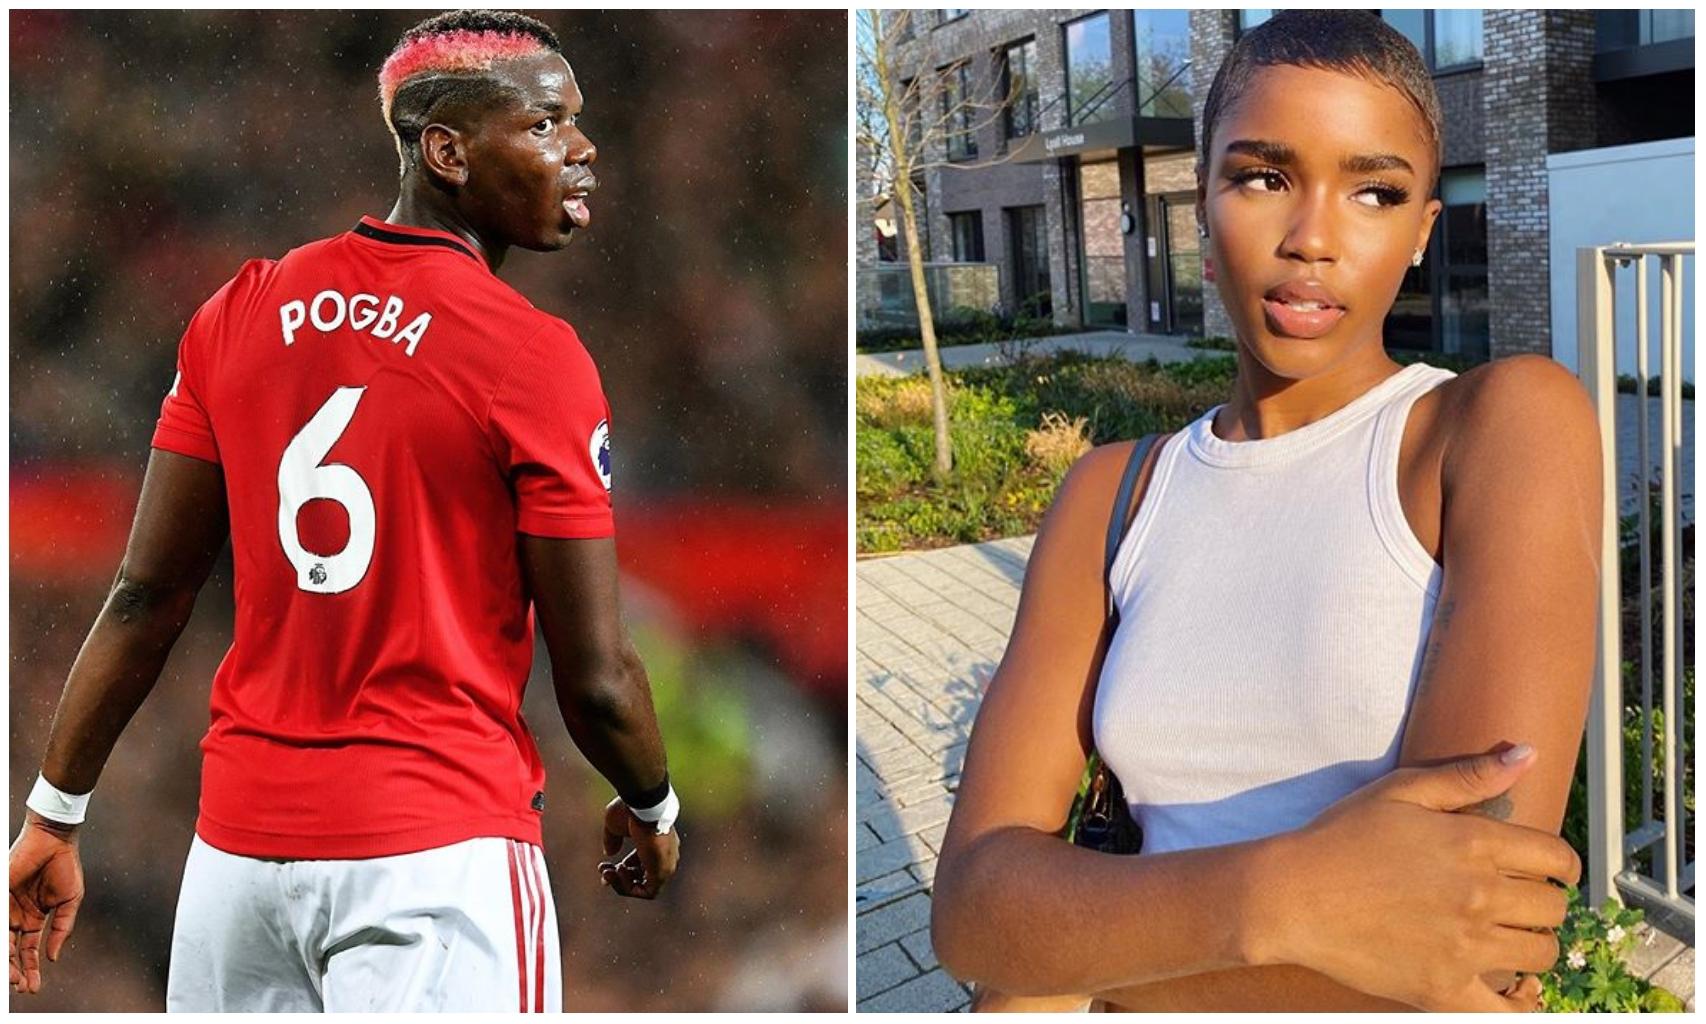 'Manchester United are sh!t' – Model Evss aim dig at Ole Gunnar Solskjaer's team (Video)